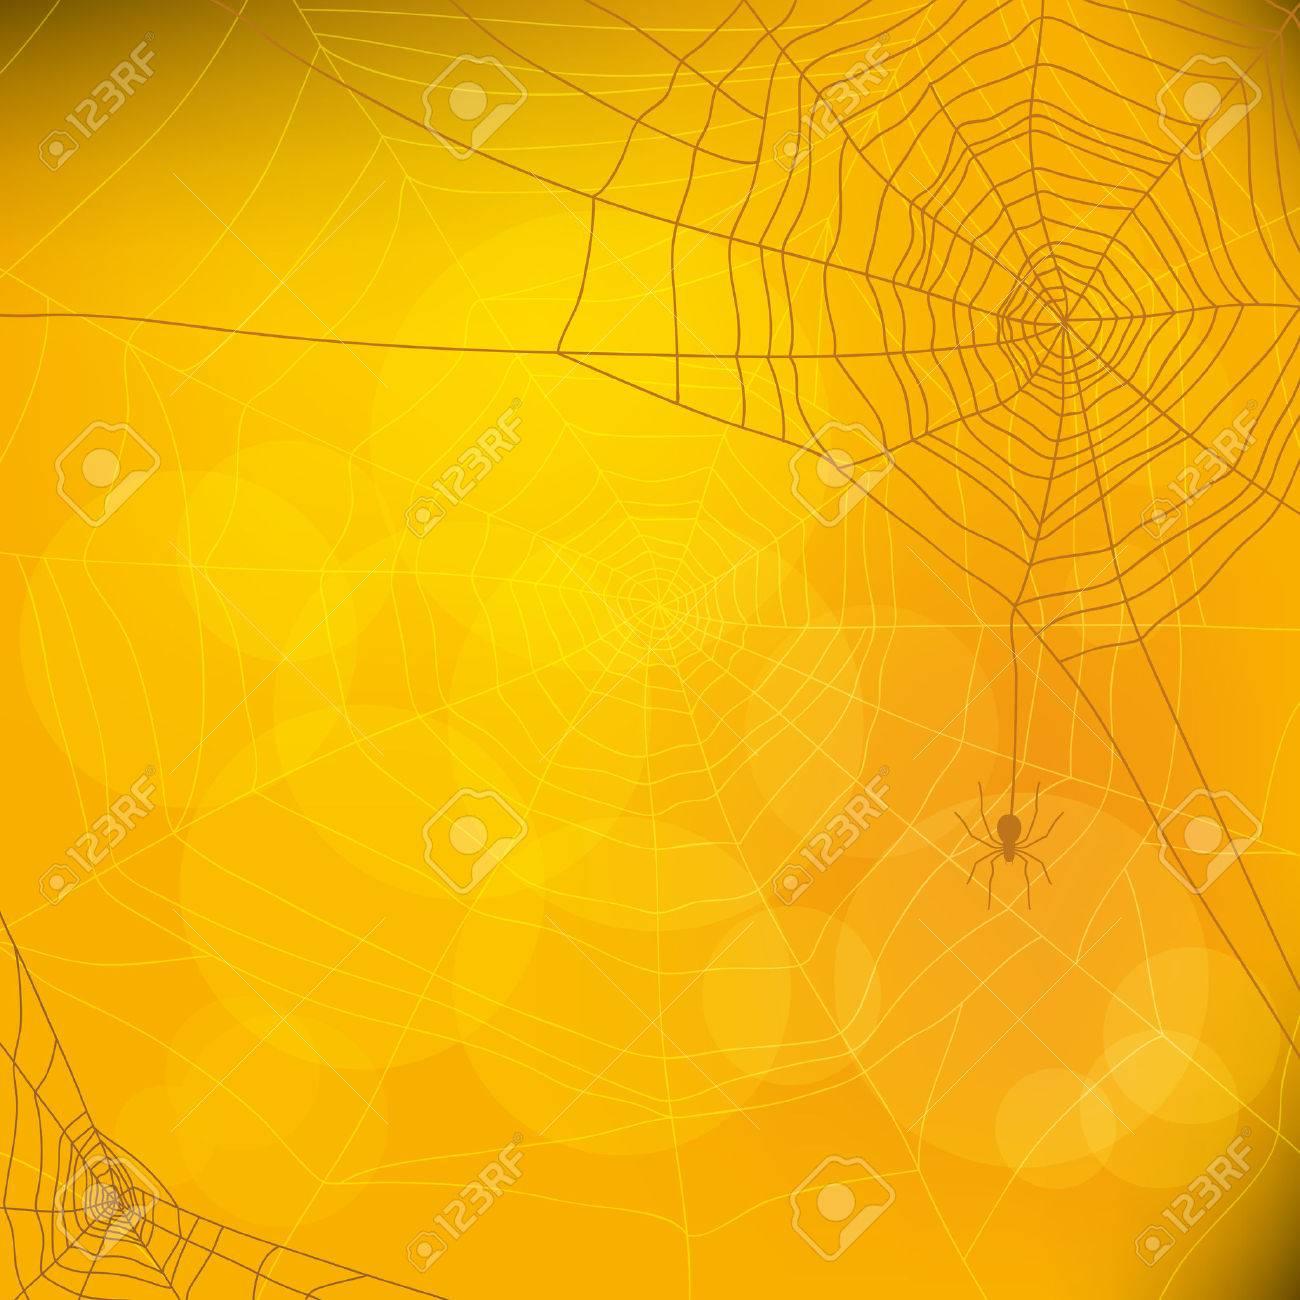 Halloween autumn background with spider web, vector illustration - 45001733